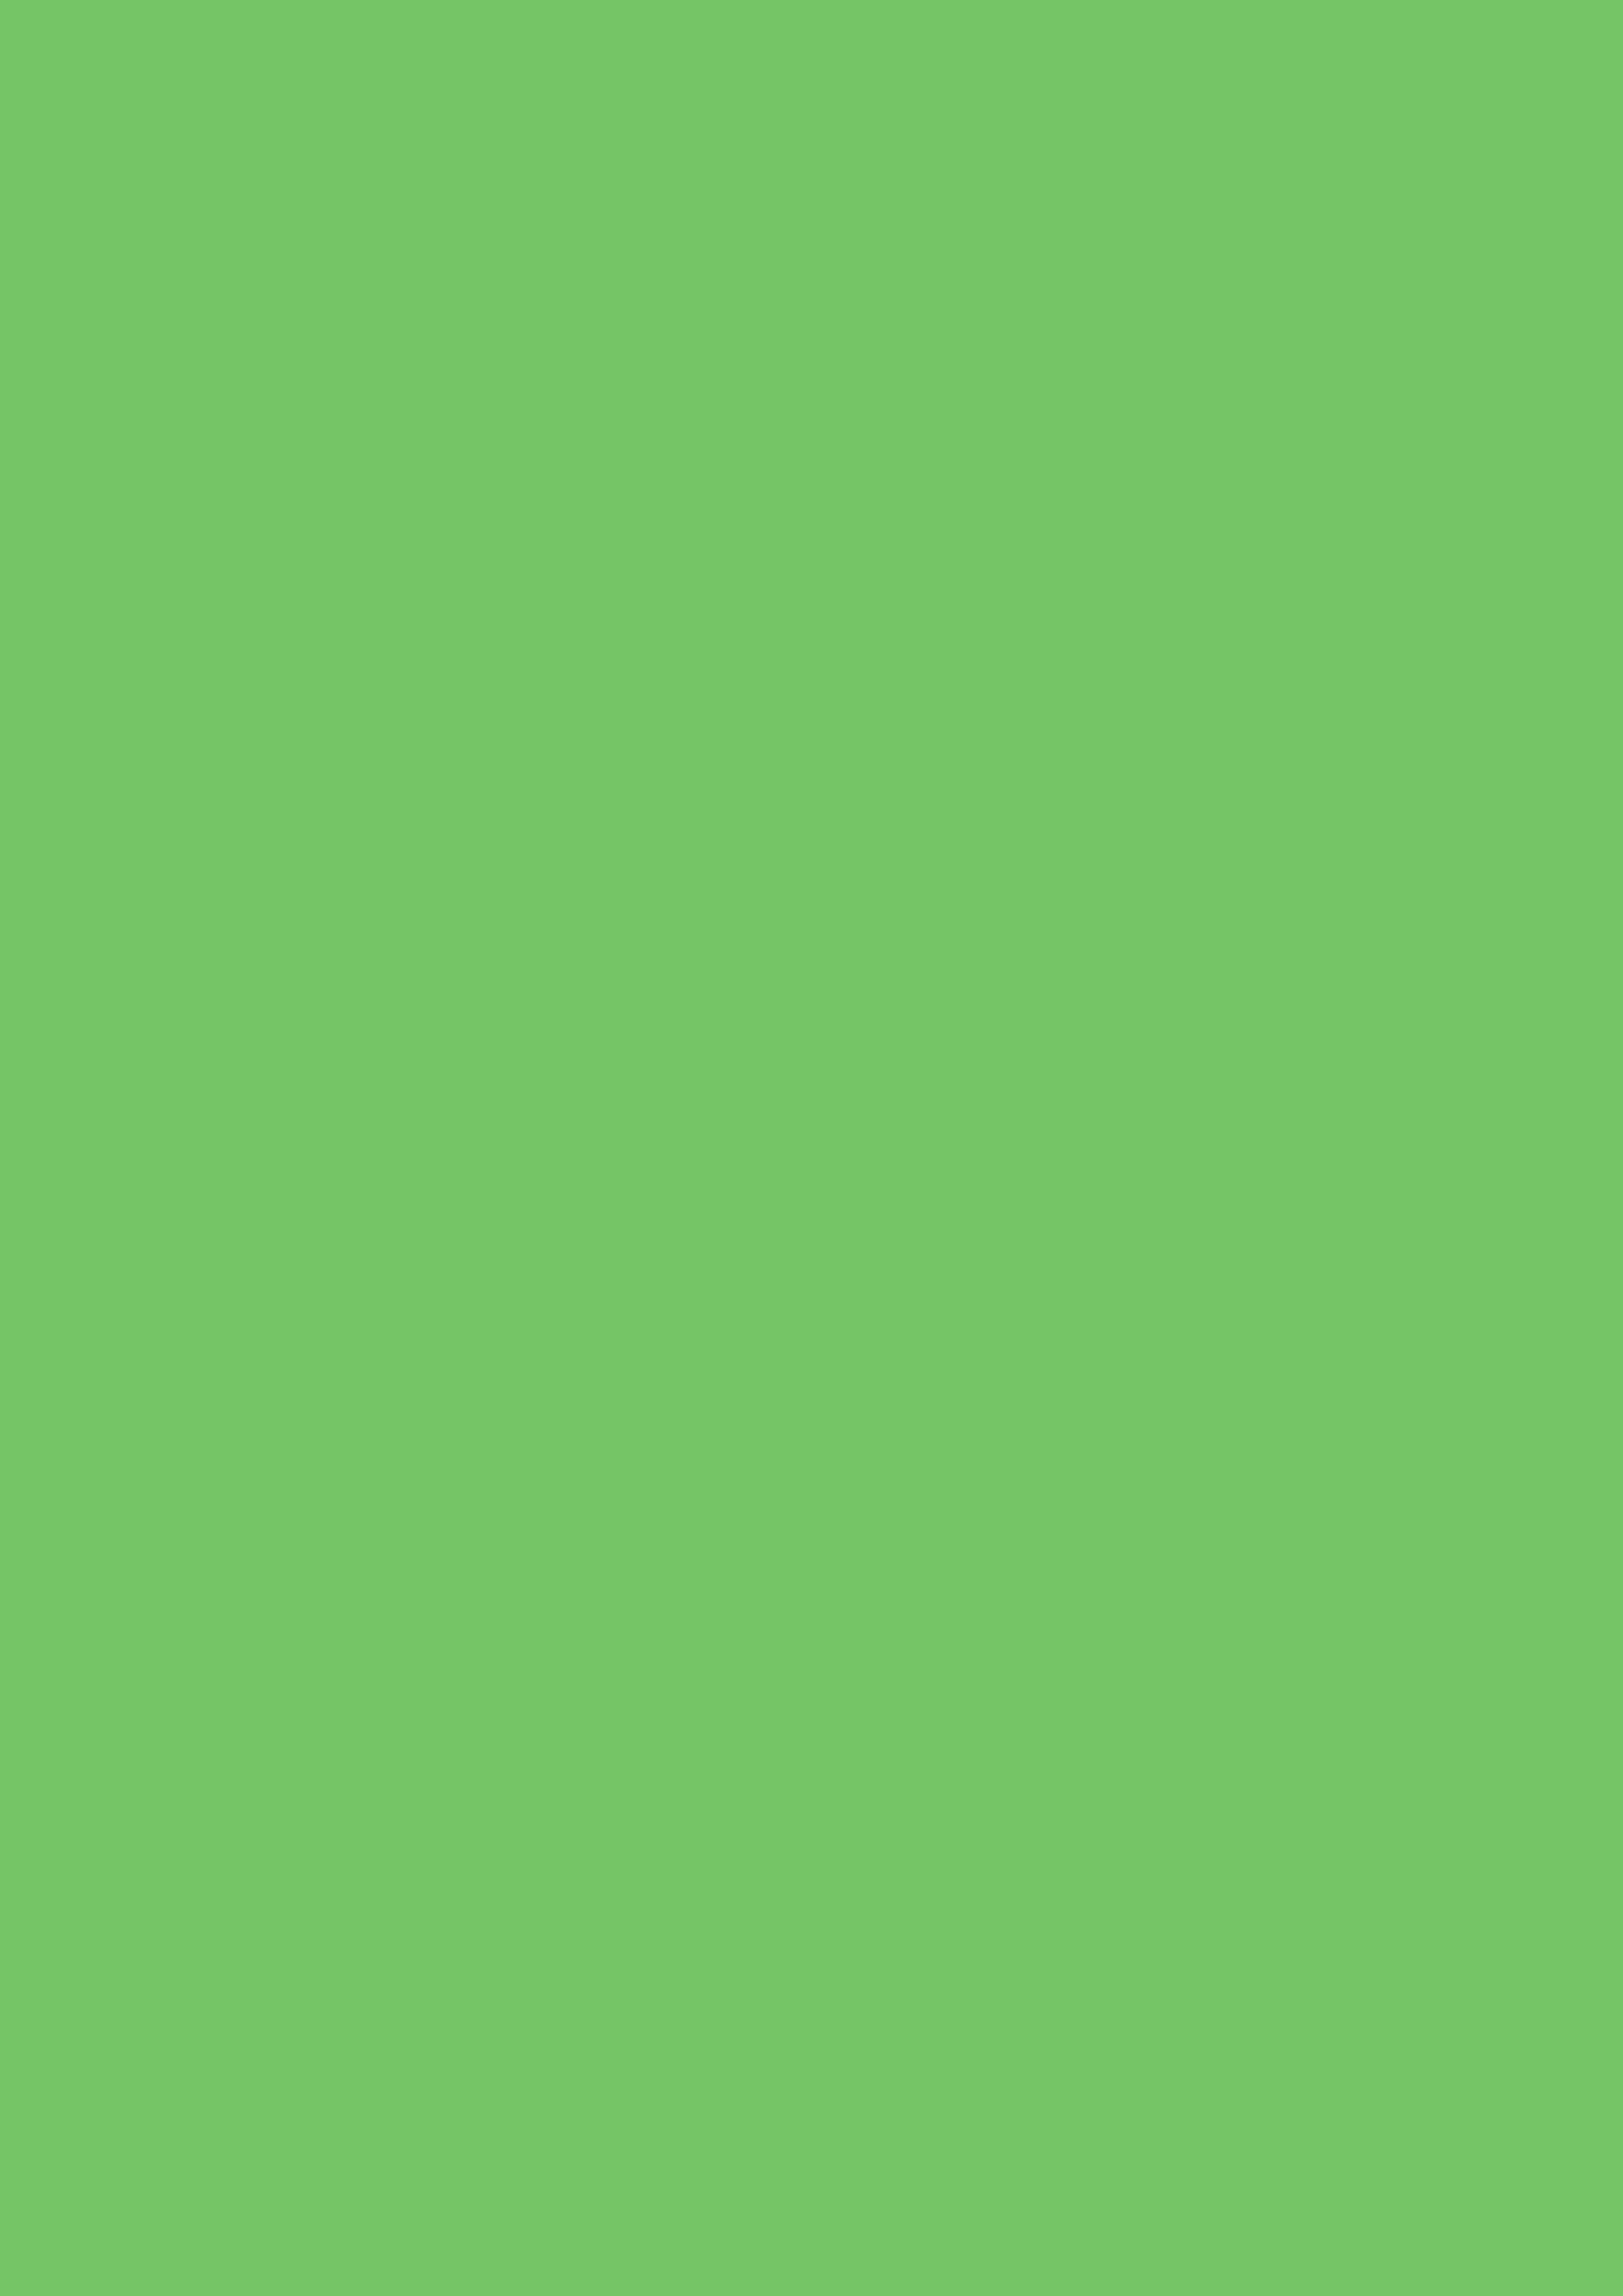 2480x3508 Mantis Solid Color Background